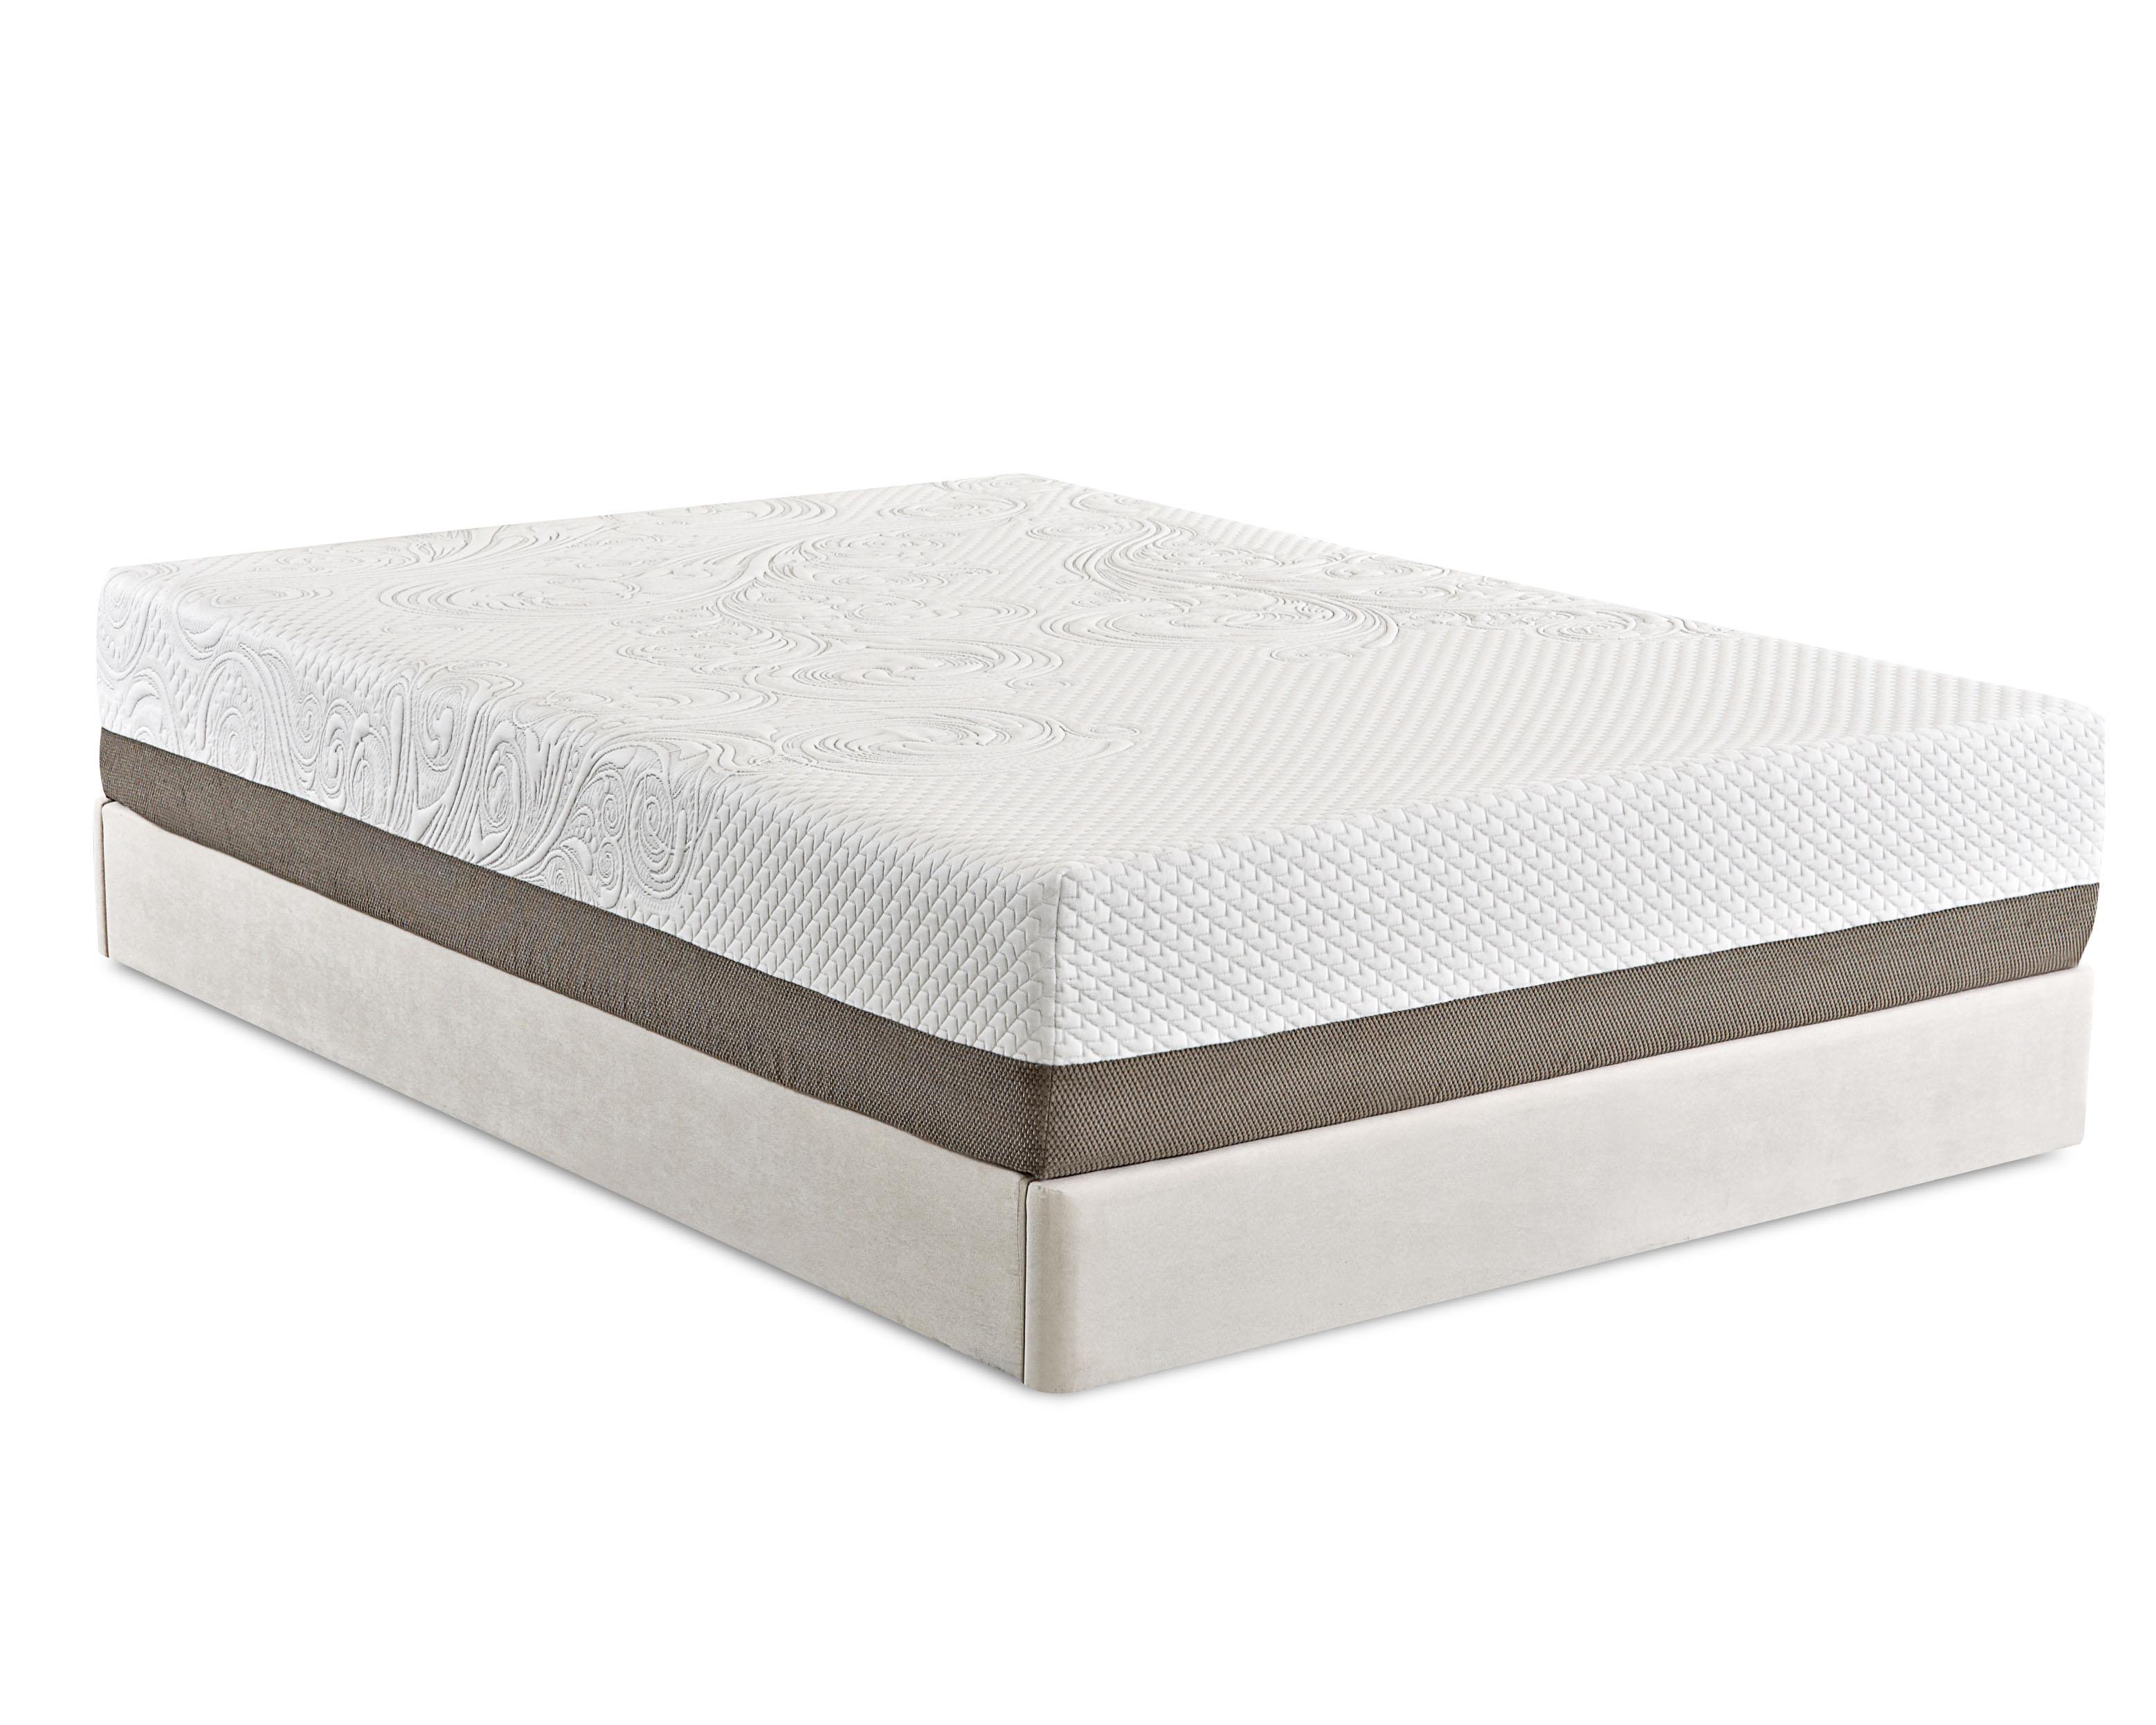 Enso Sleep Systems Strata Enso King 12 Quot Gel Memory Foam